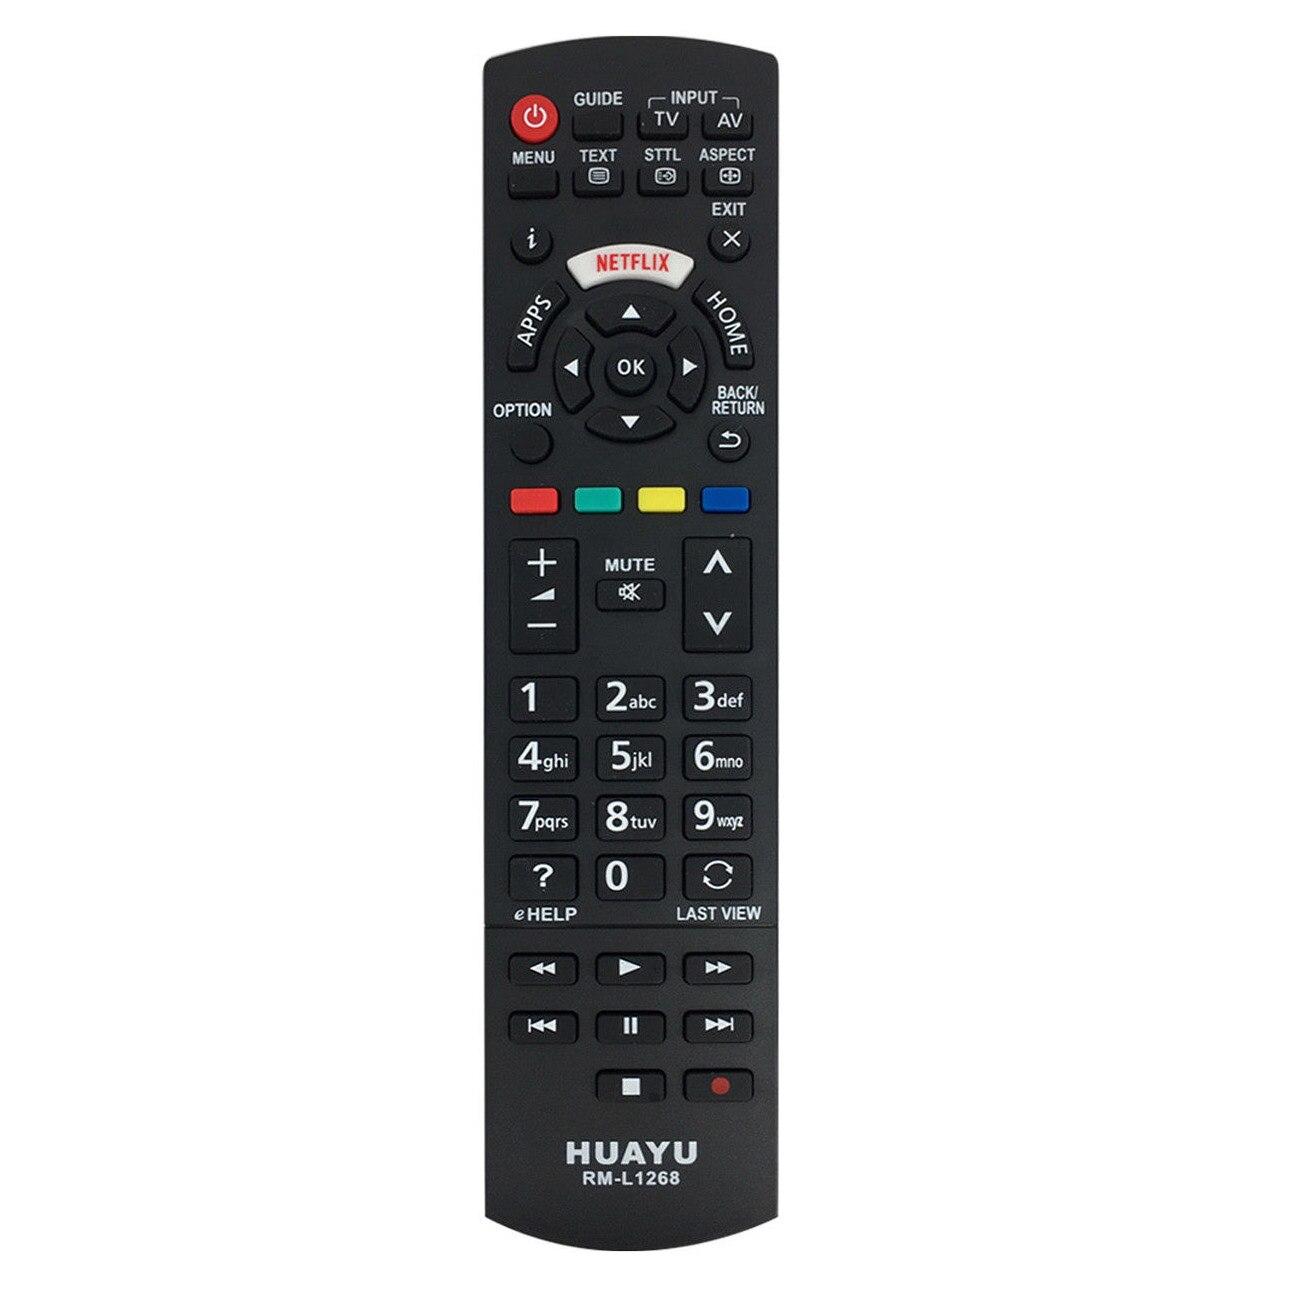 IG-HUAYU Rm-L1268 For Panasonic Tv With Netflix Buttons Remote Control N2Qayb001008 N2Qayb000926 N2Qayb001013